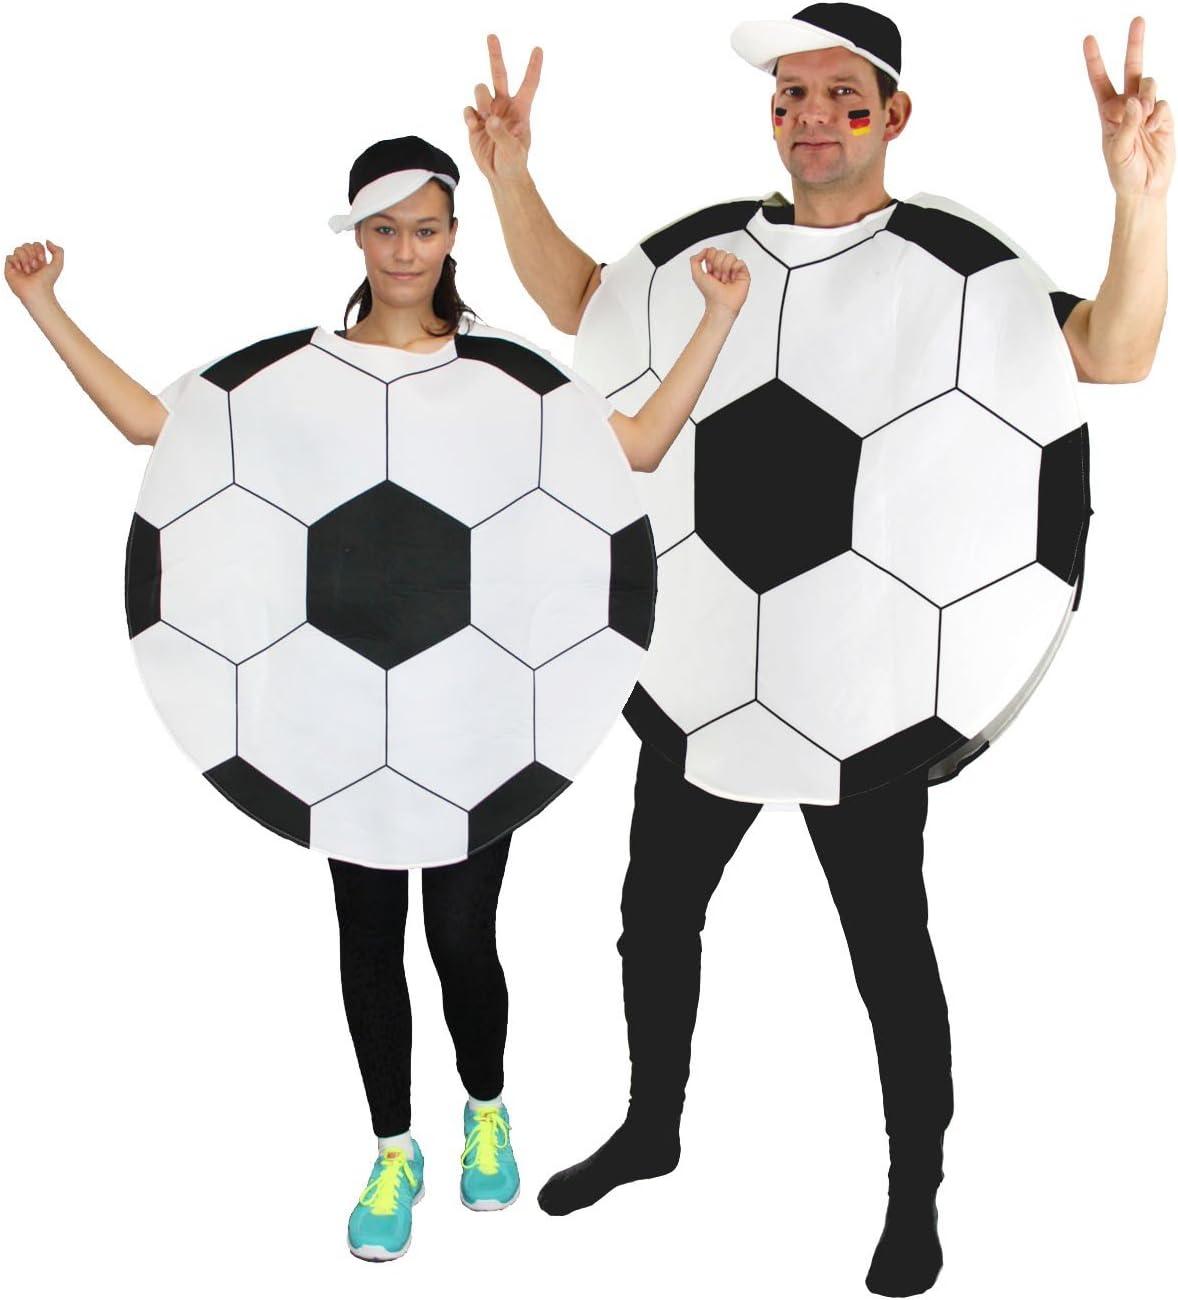 Foxxeo 40012 | Disfraz de pelota de fútbol, talla M - XXL